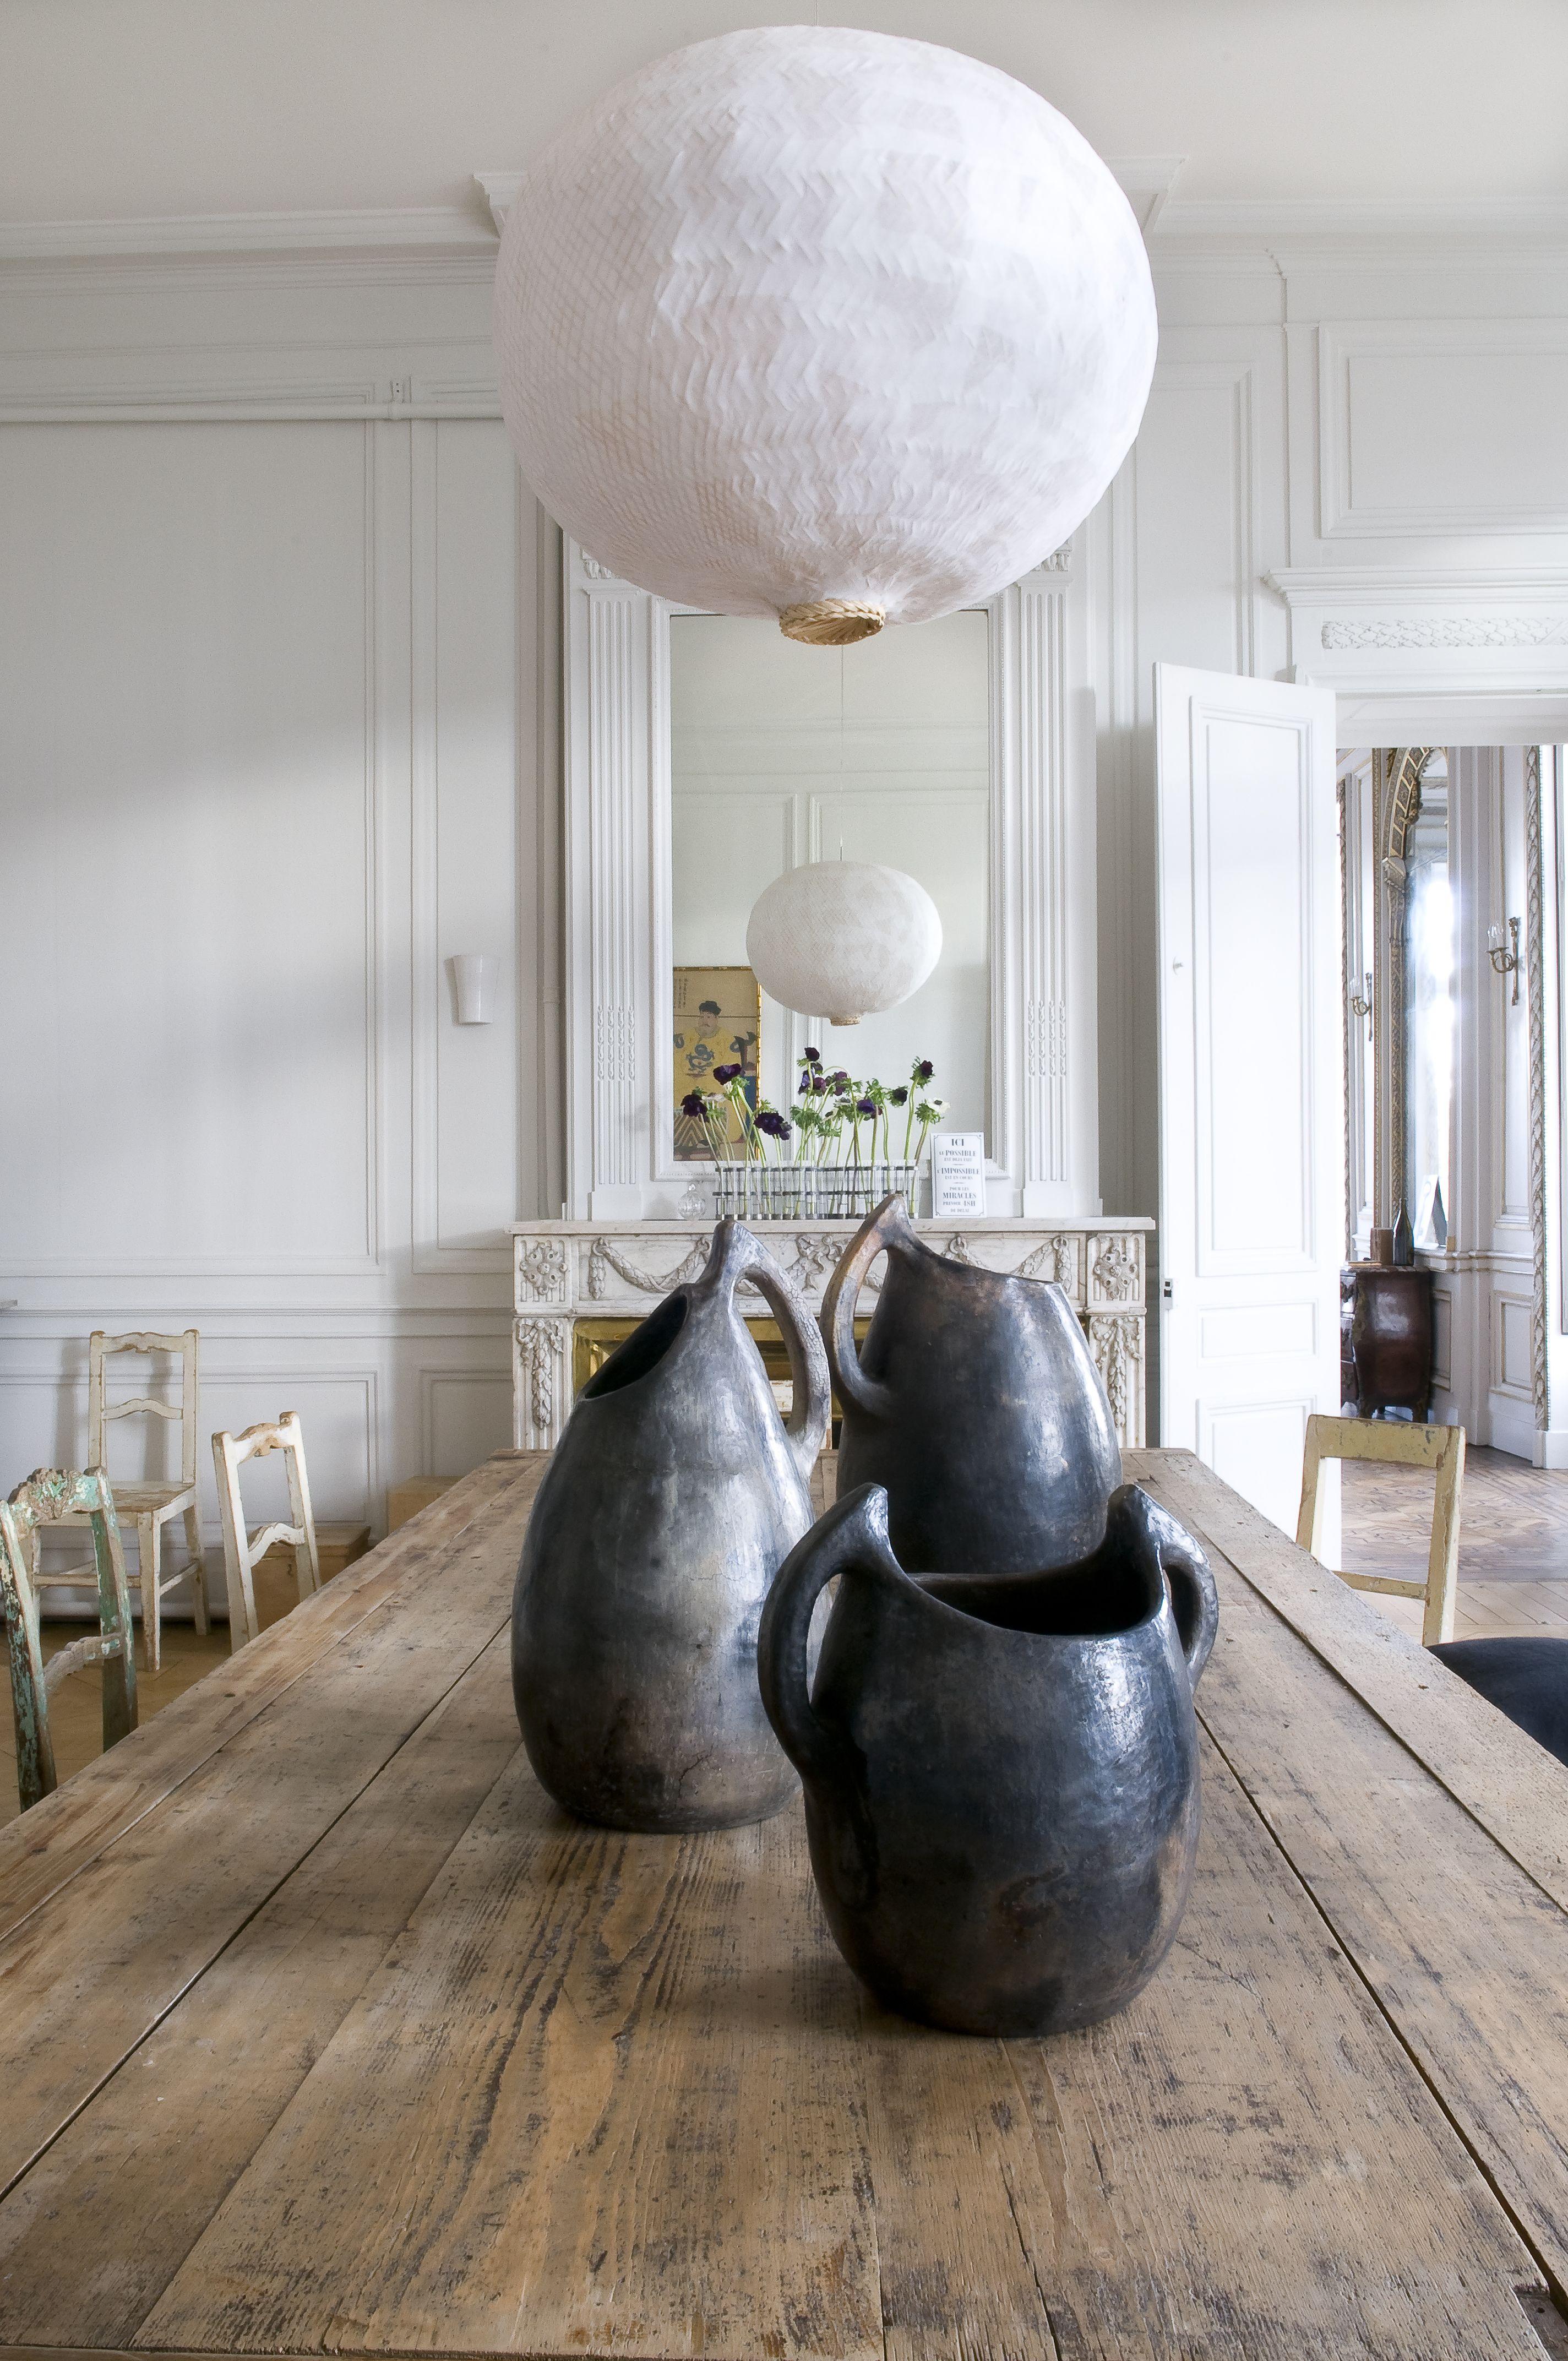 Appartement Lyon 2 by Maison HAND | HOME | Pinterest | Lyon ...